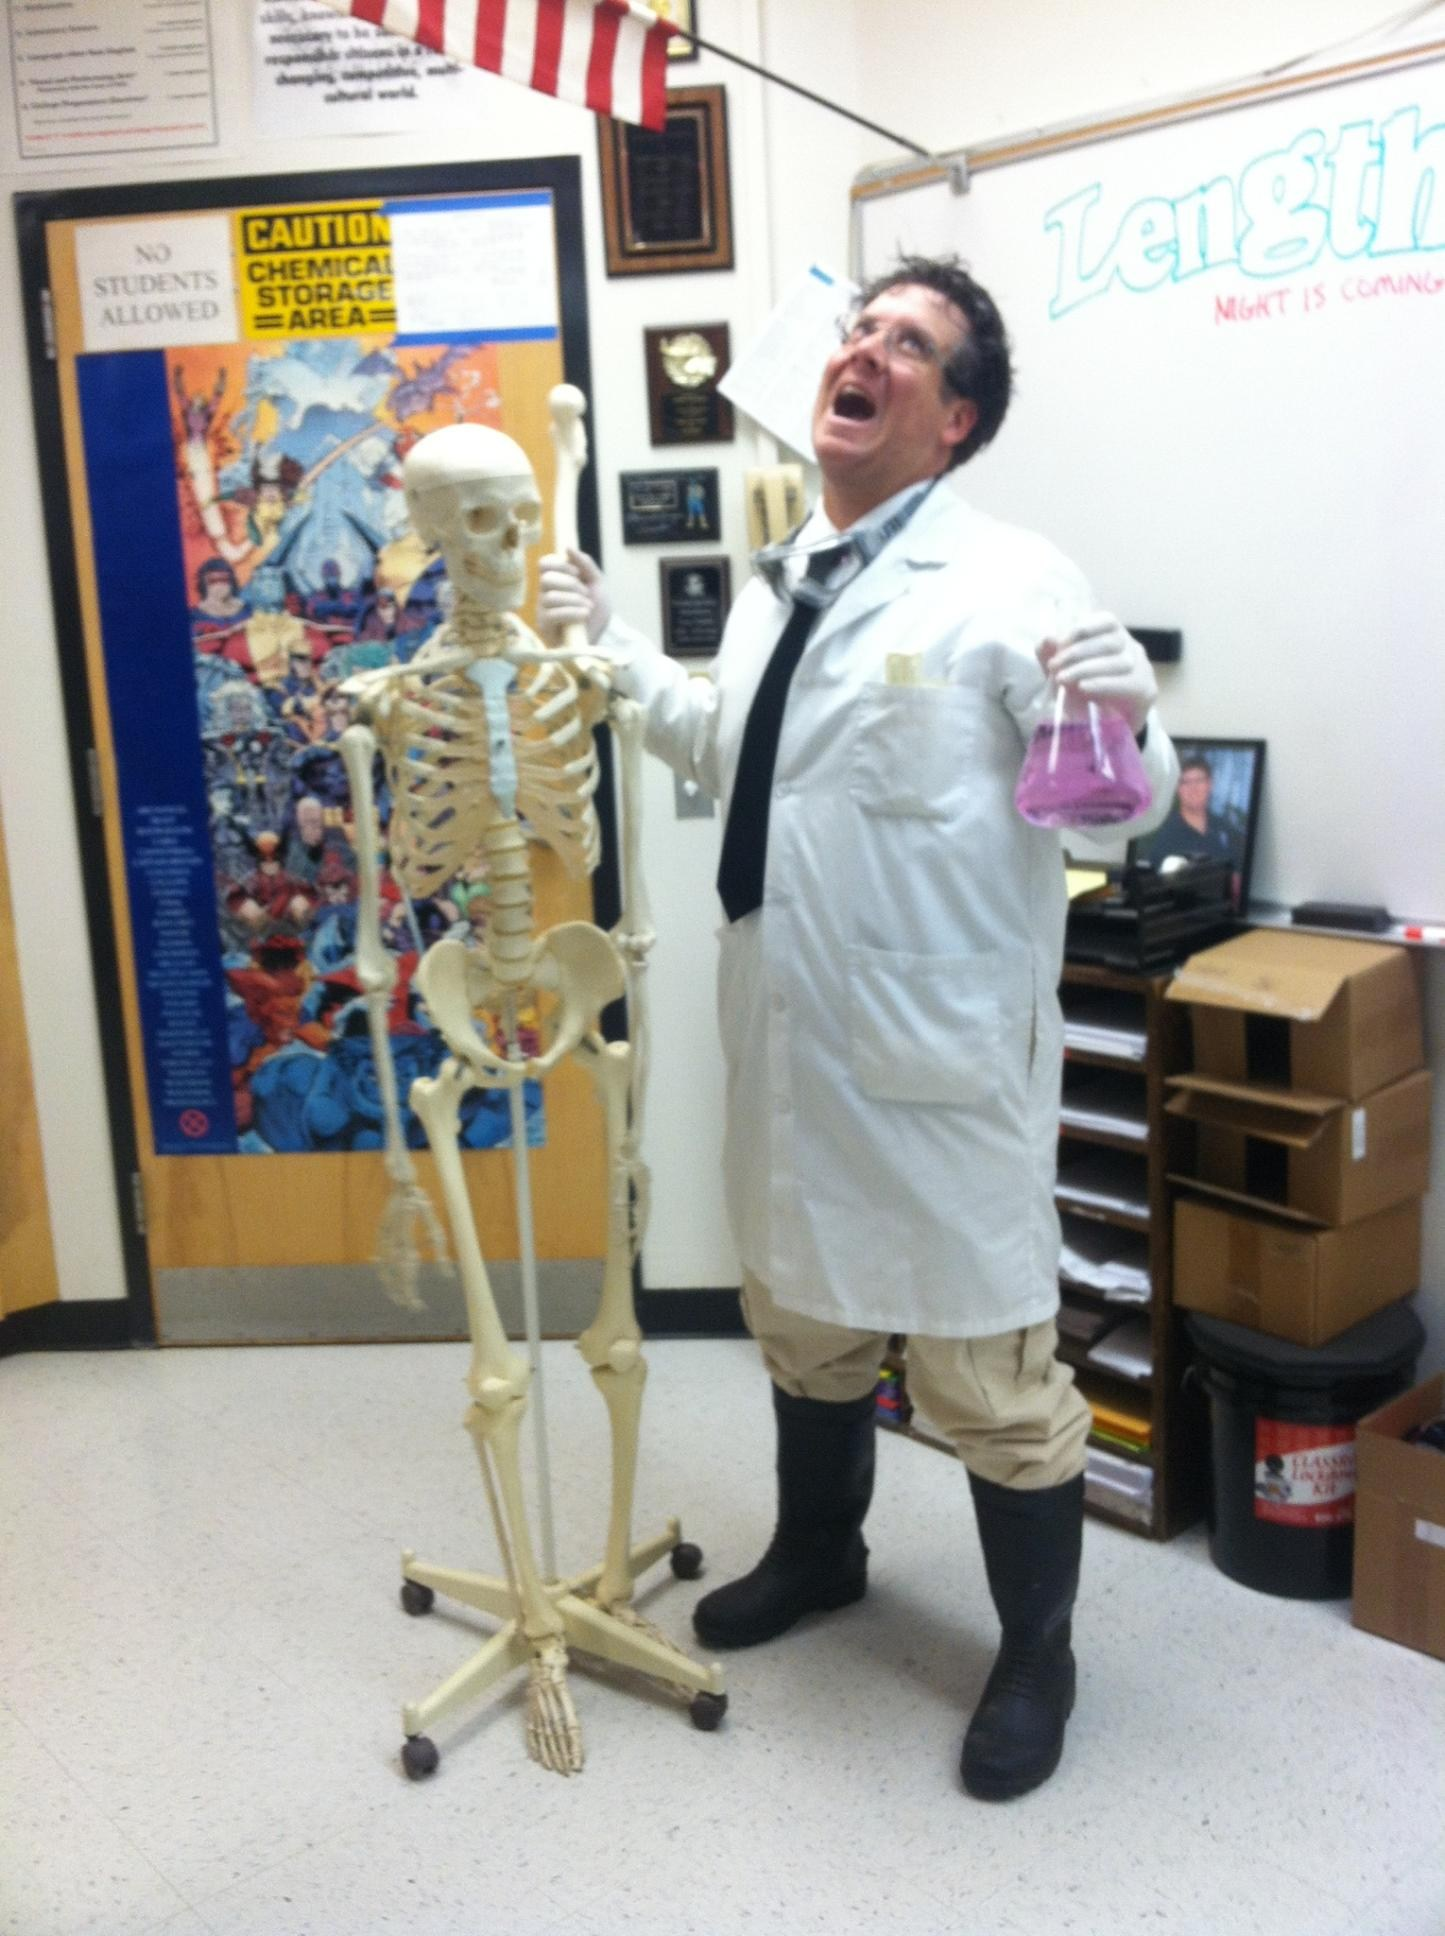 Mr. Valenti having a good day.